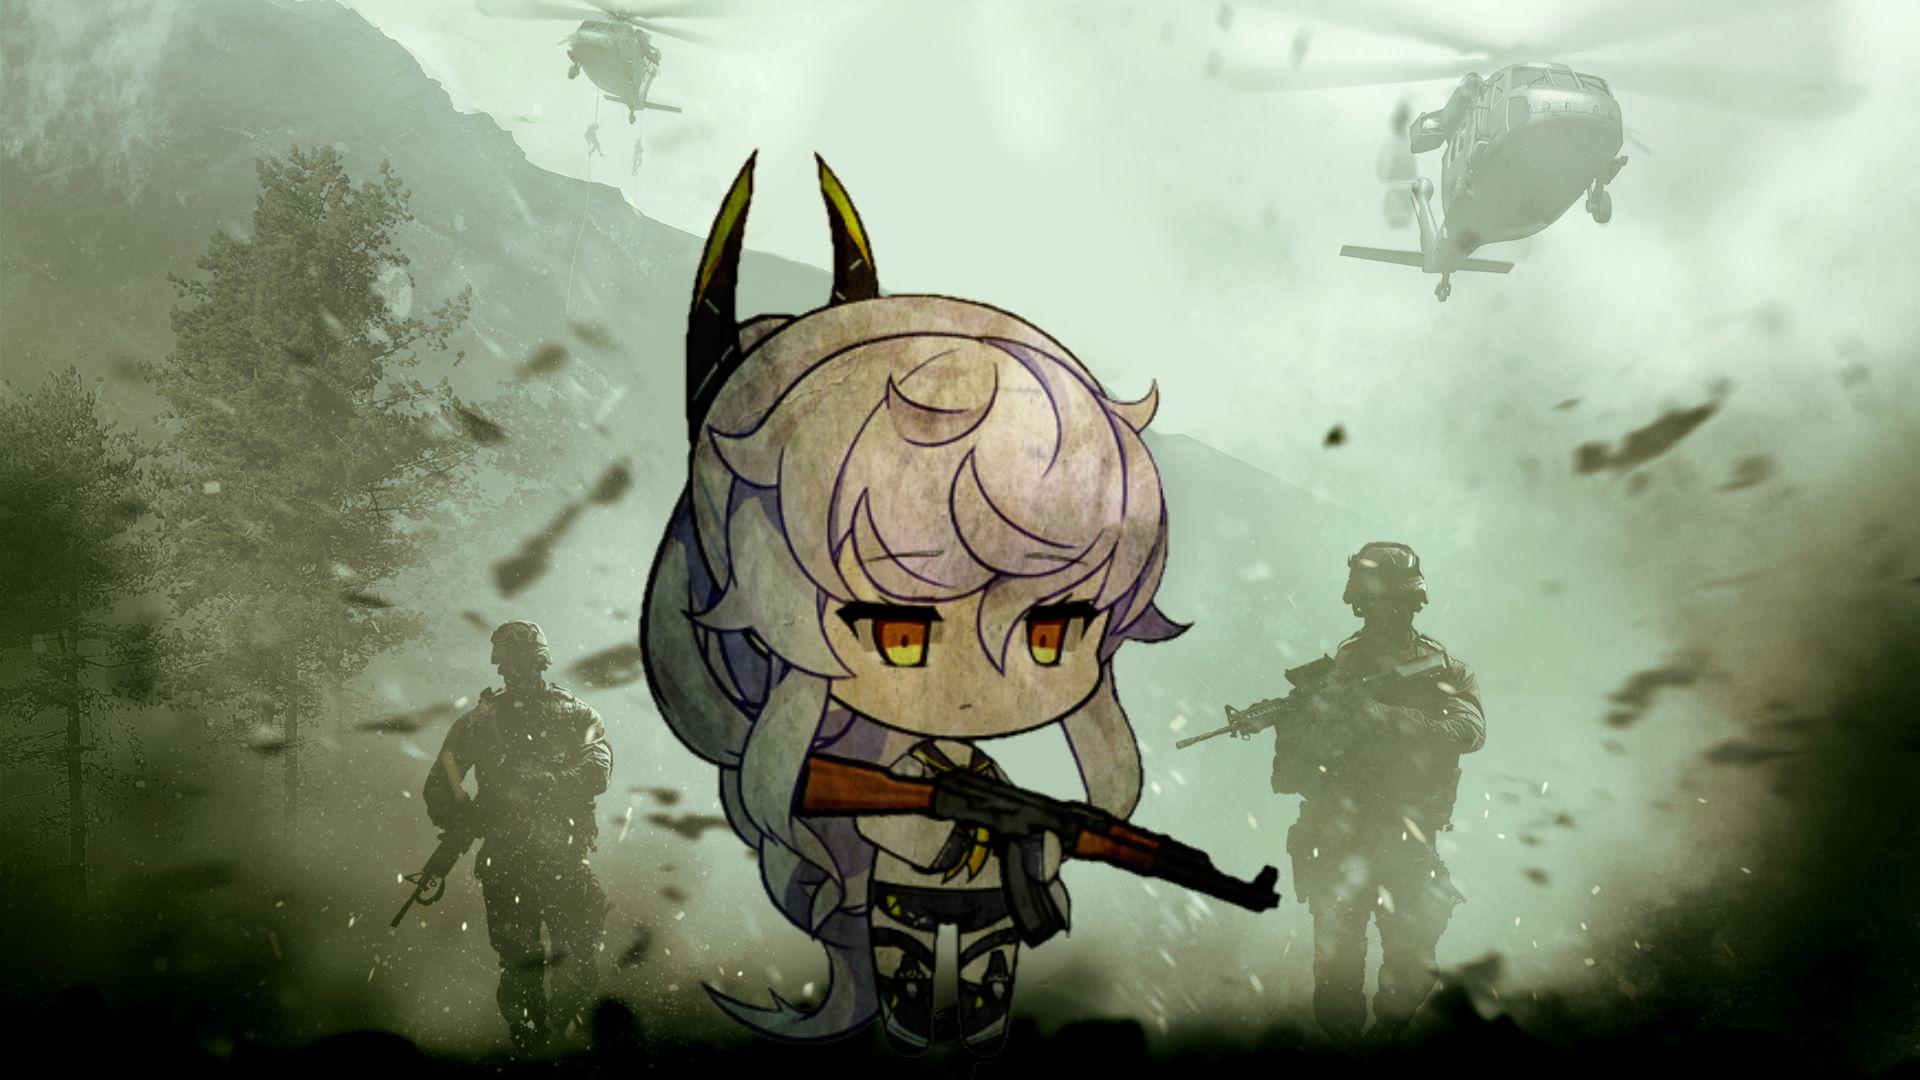 Call Of Duty Modern Warfare With Purifier Wallpaper Azur Lane